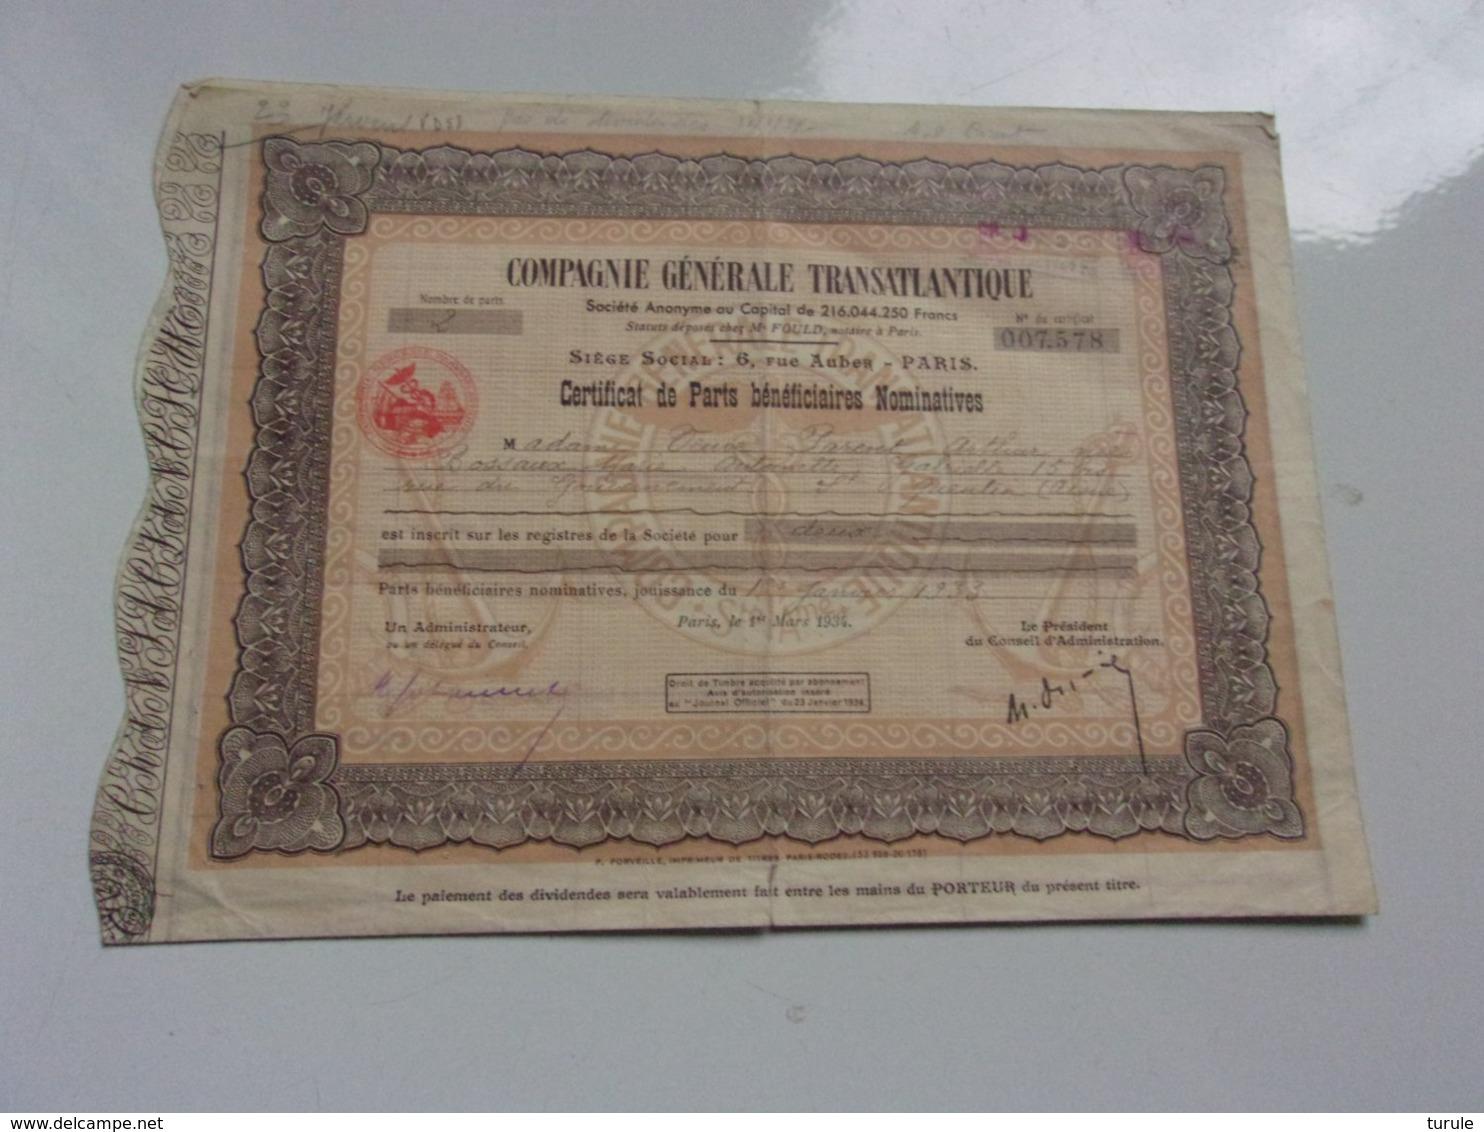 COMPAGNIE GENERALE TRANSATLANTIQUE (certificat) 1934 - Shareholdings